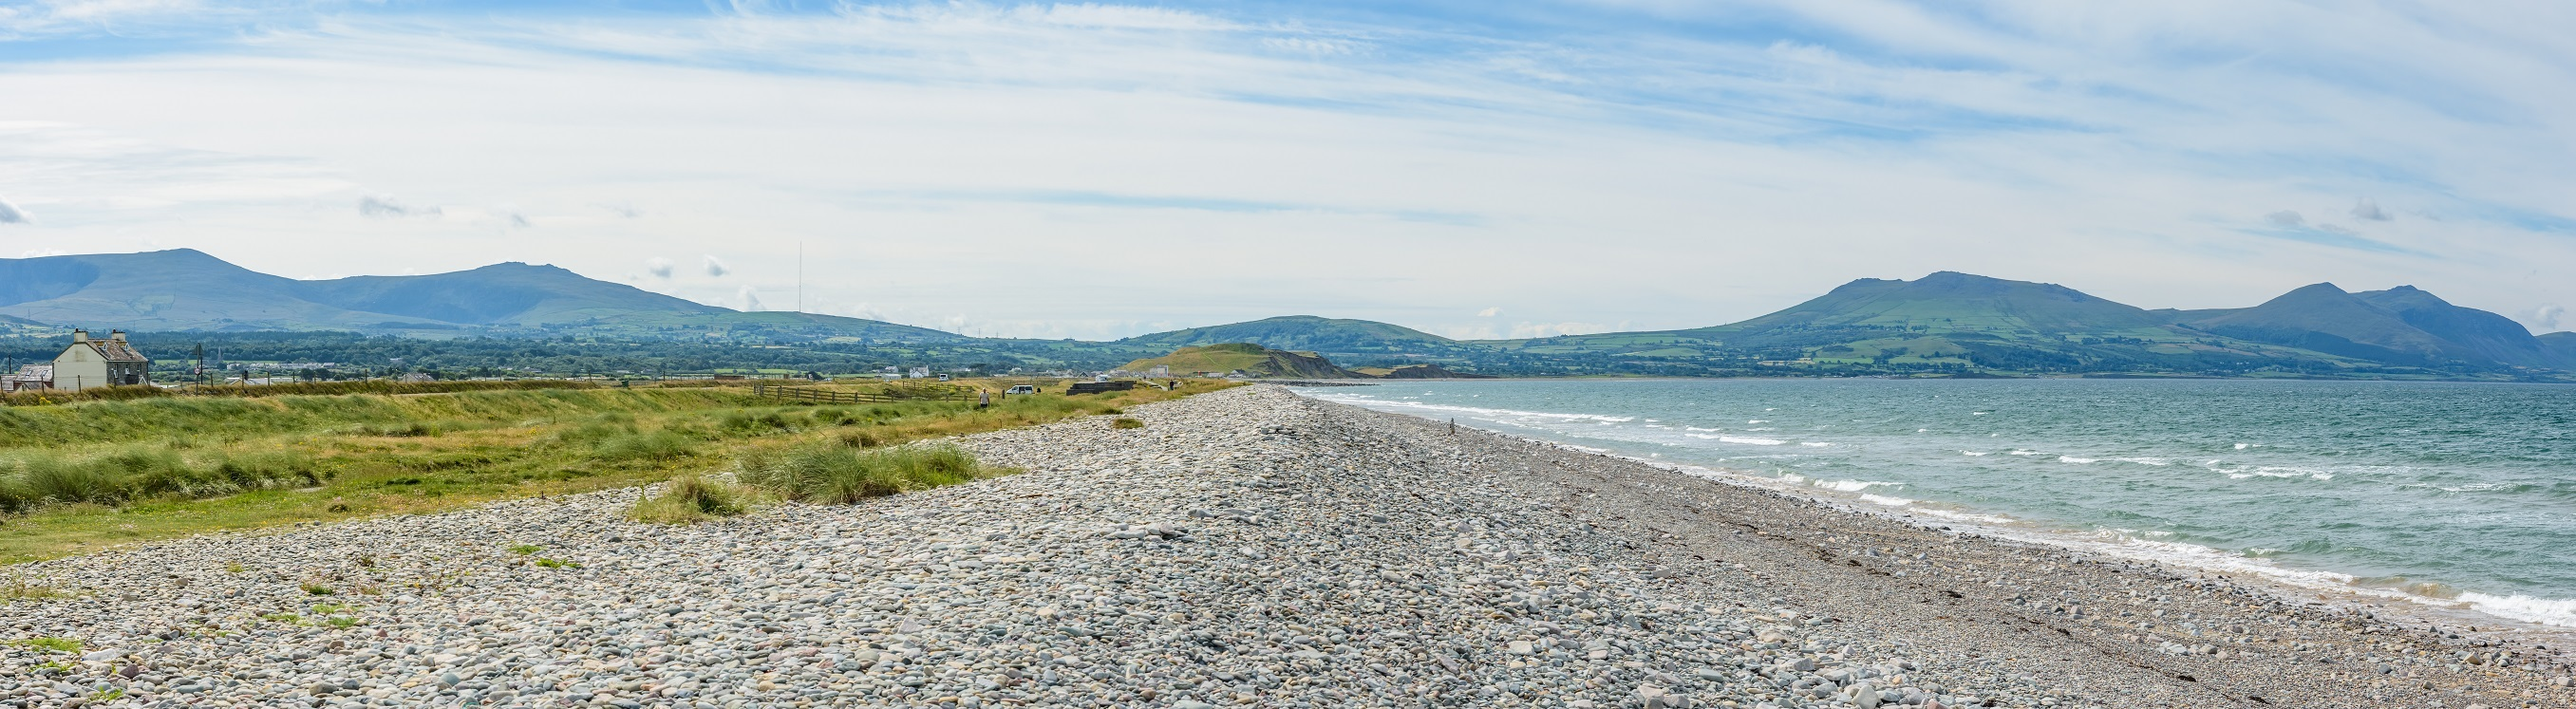 Coastline west of Caernarfon  Pic Daniel Hauck